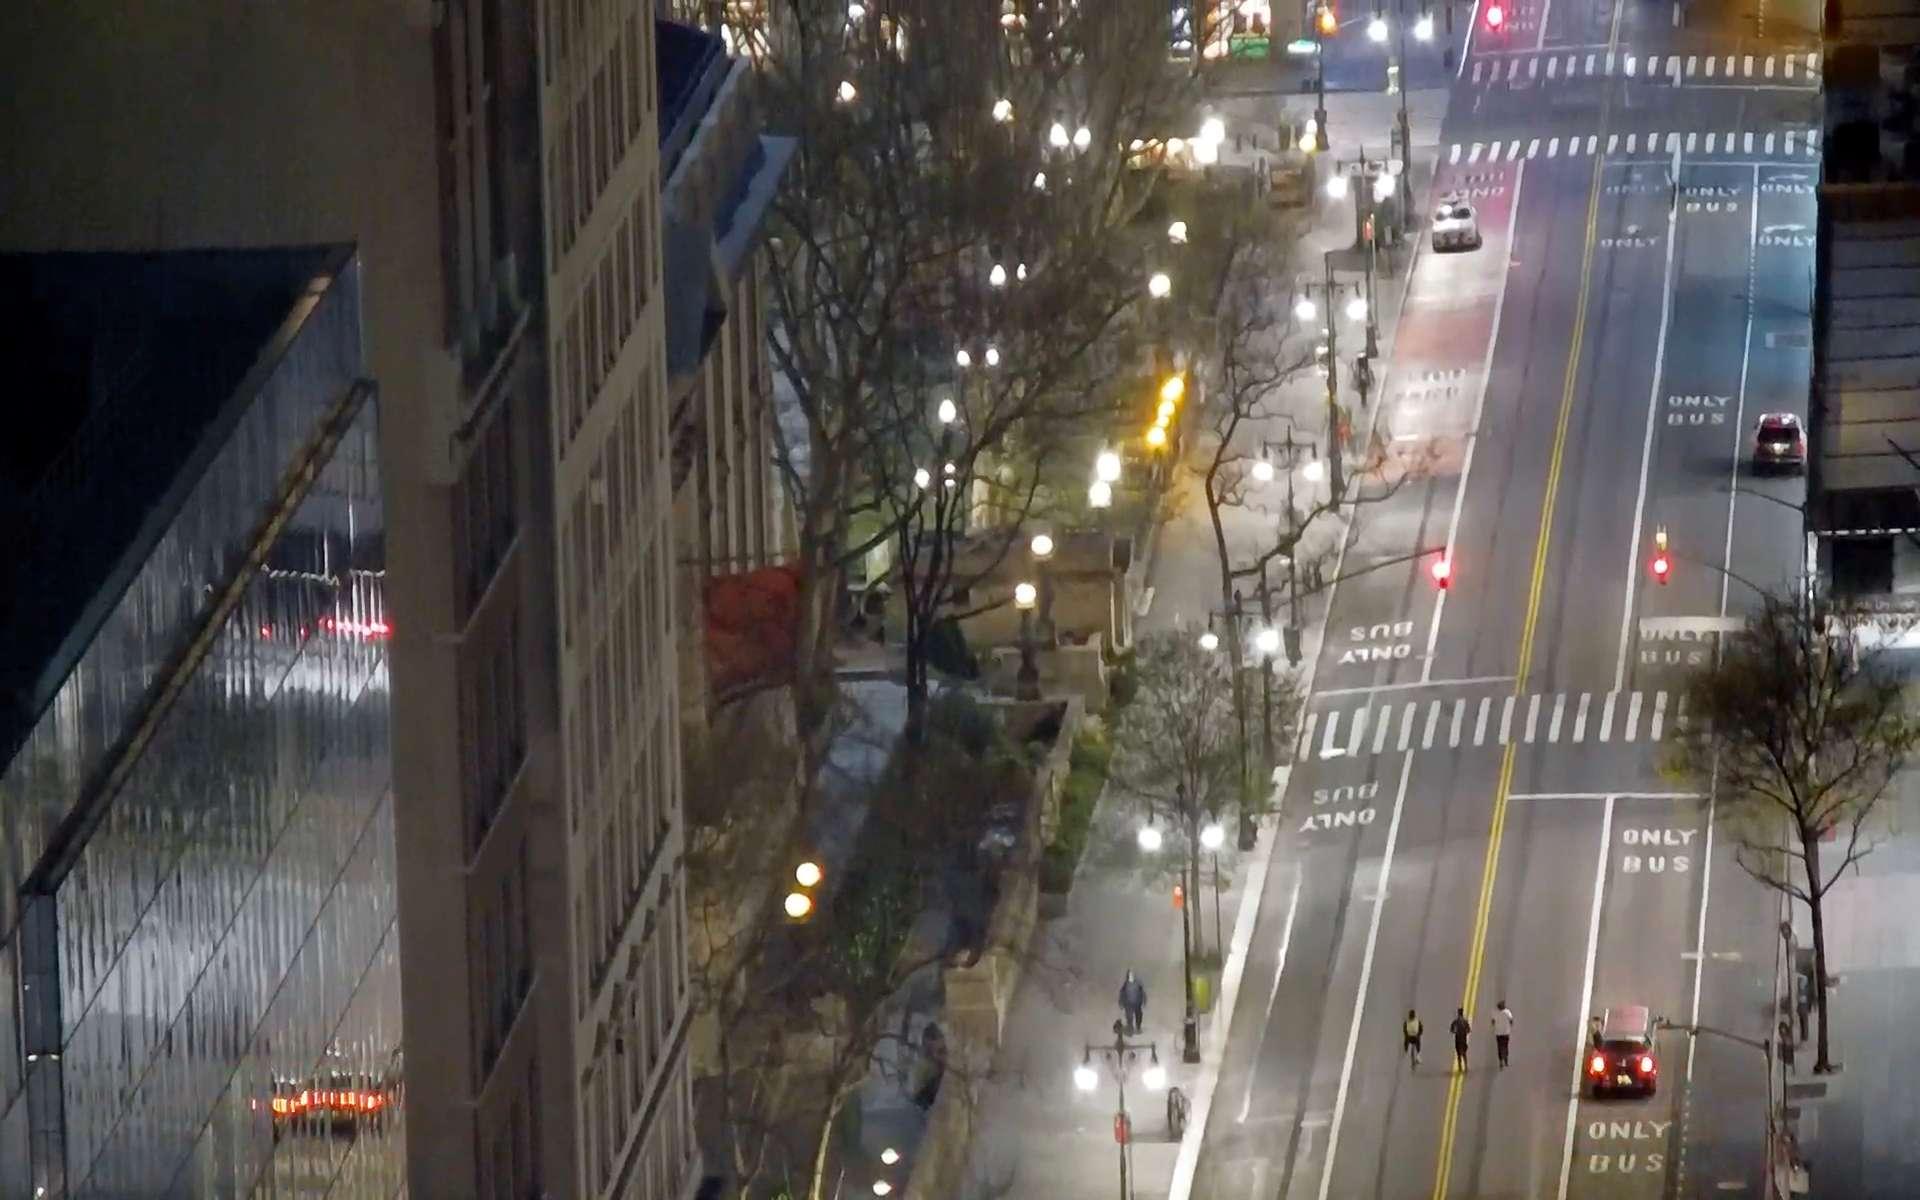 42nd Street, New York, New York. April 12, 2020, 9:22:57 PM PST